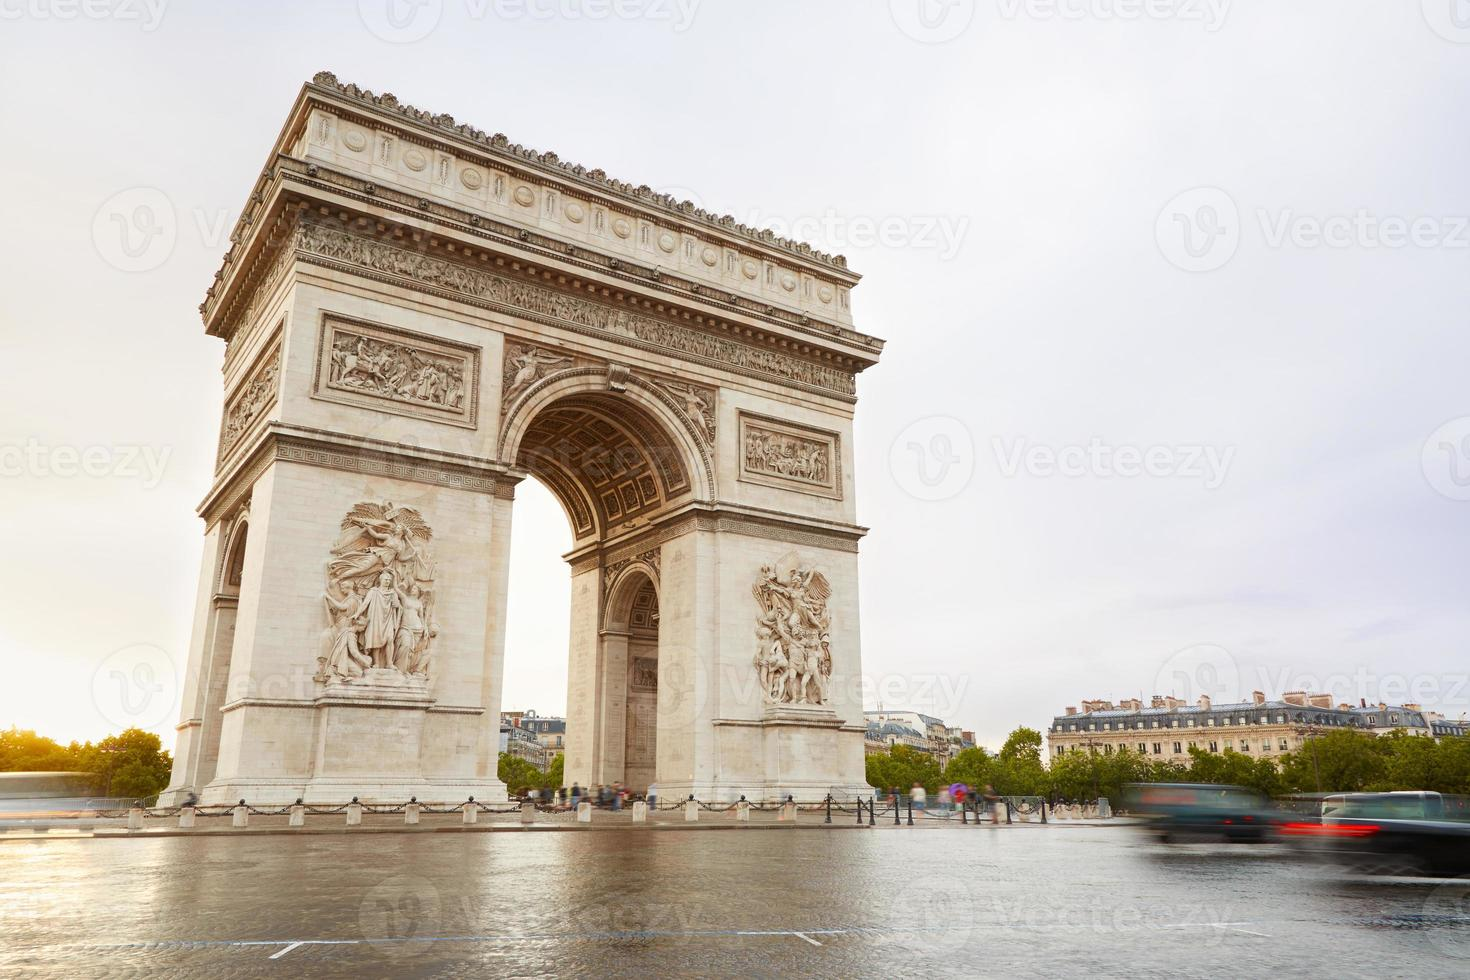 Arc de Triomphe in Paris in the morning photo